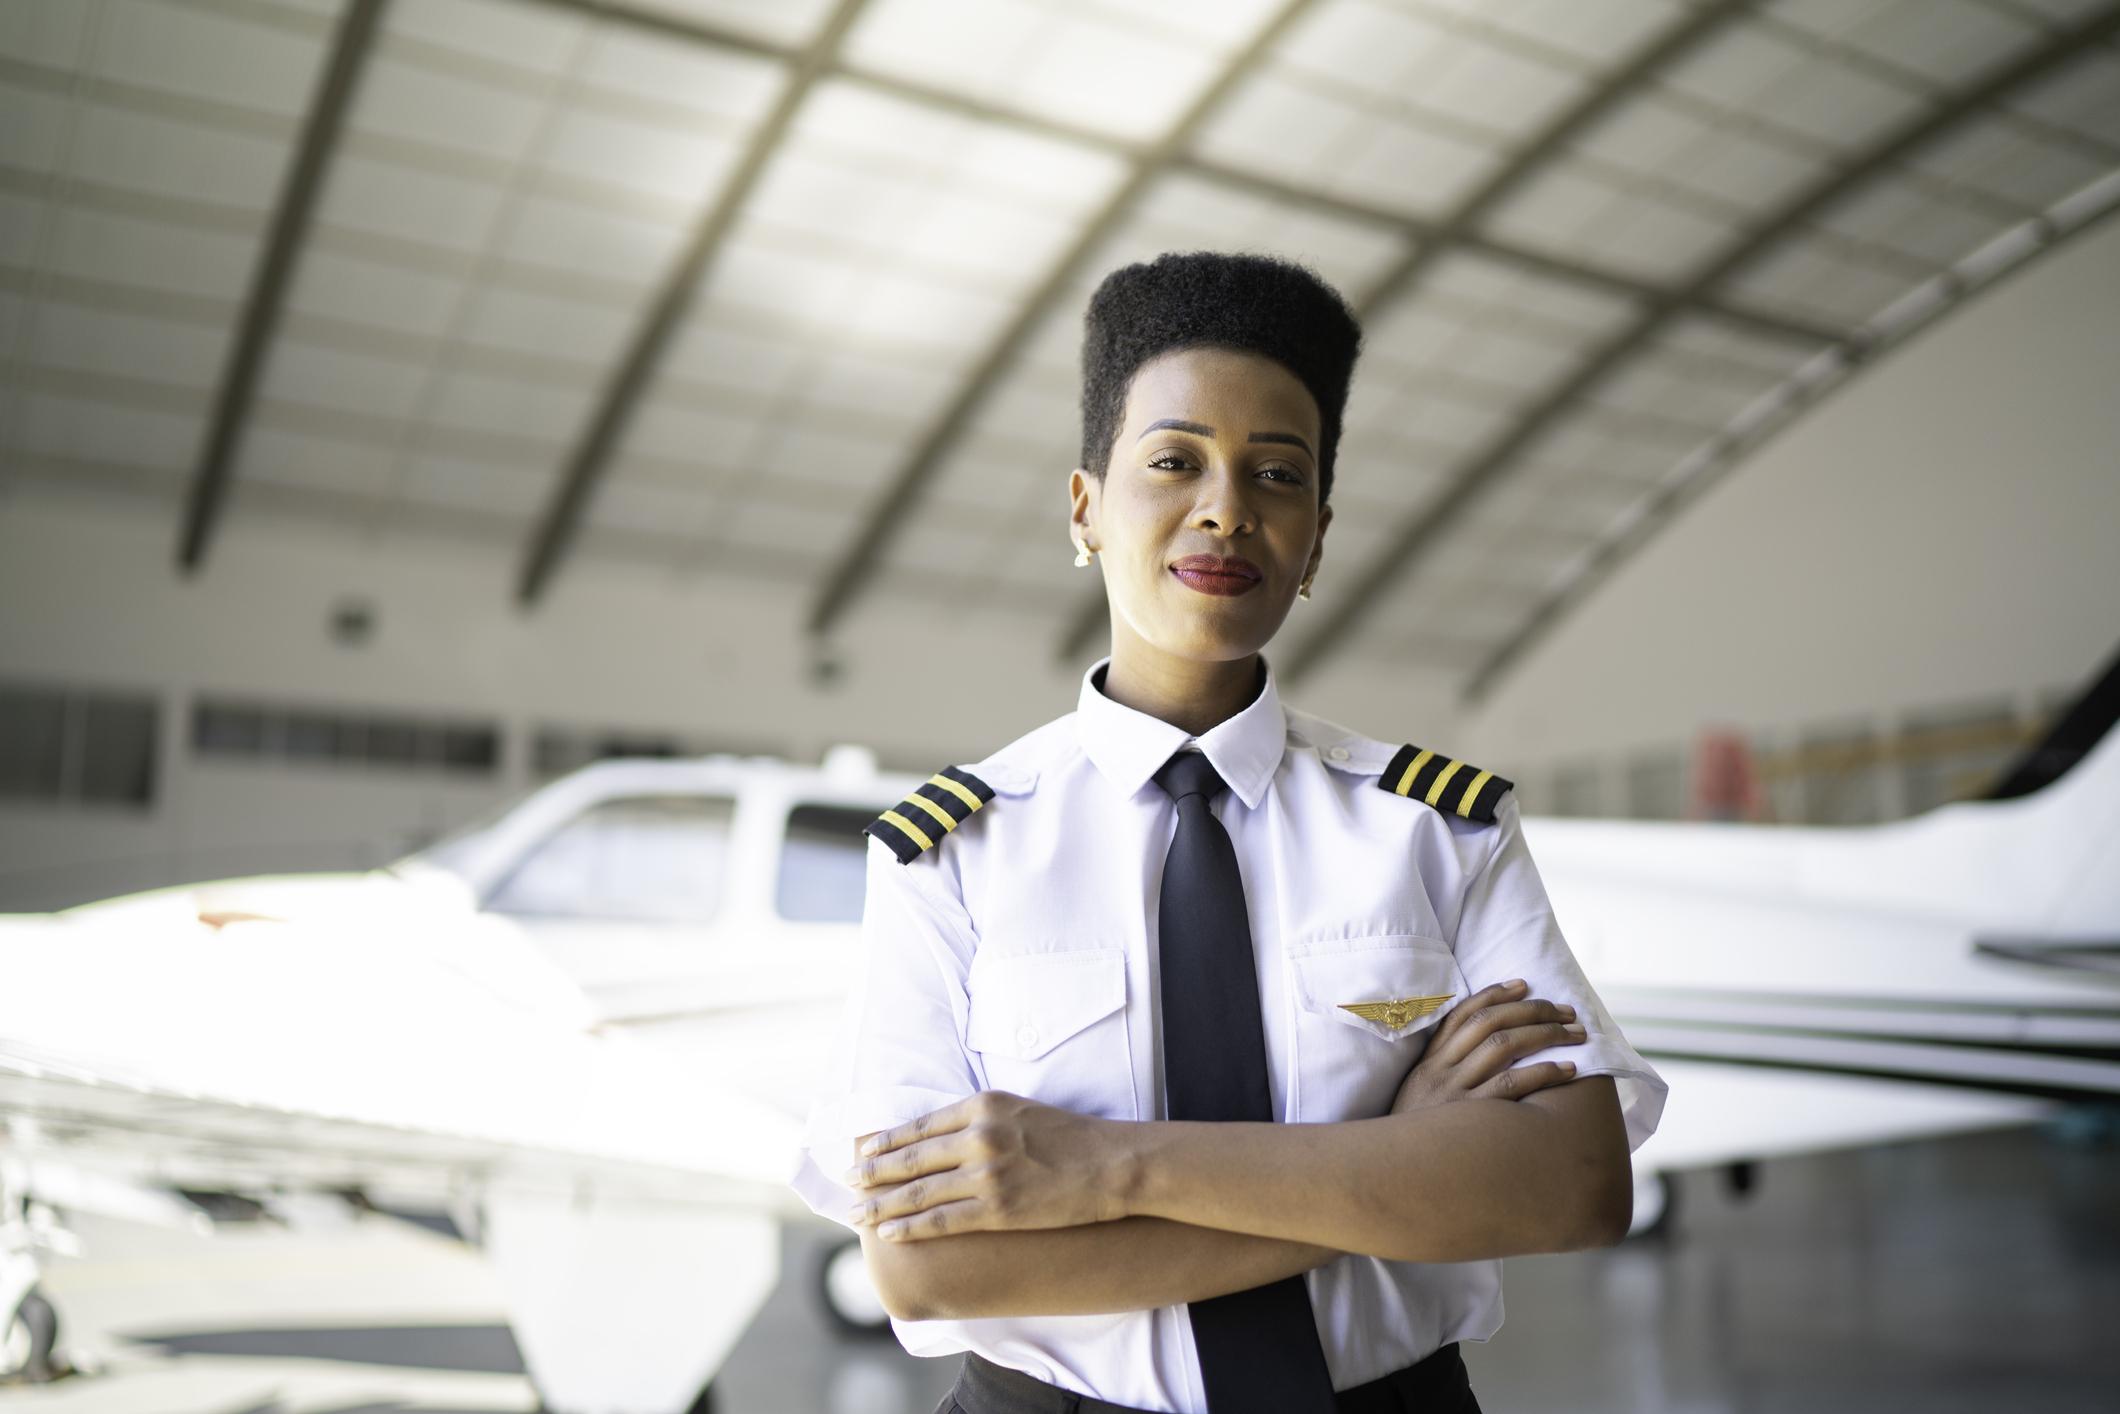 Icelandair Will Let Go Of All Its Flight Attendants, Pilots Will Do Their Duties